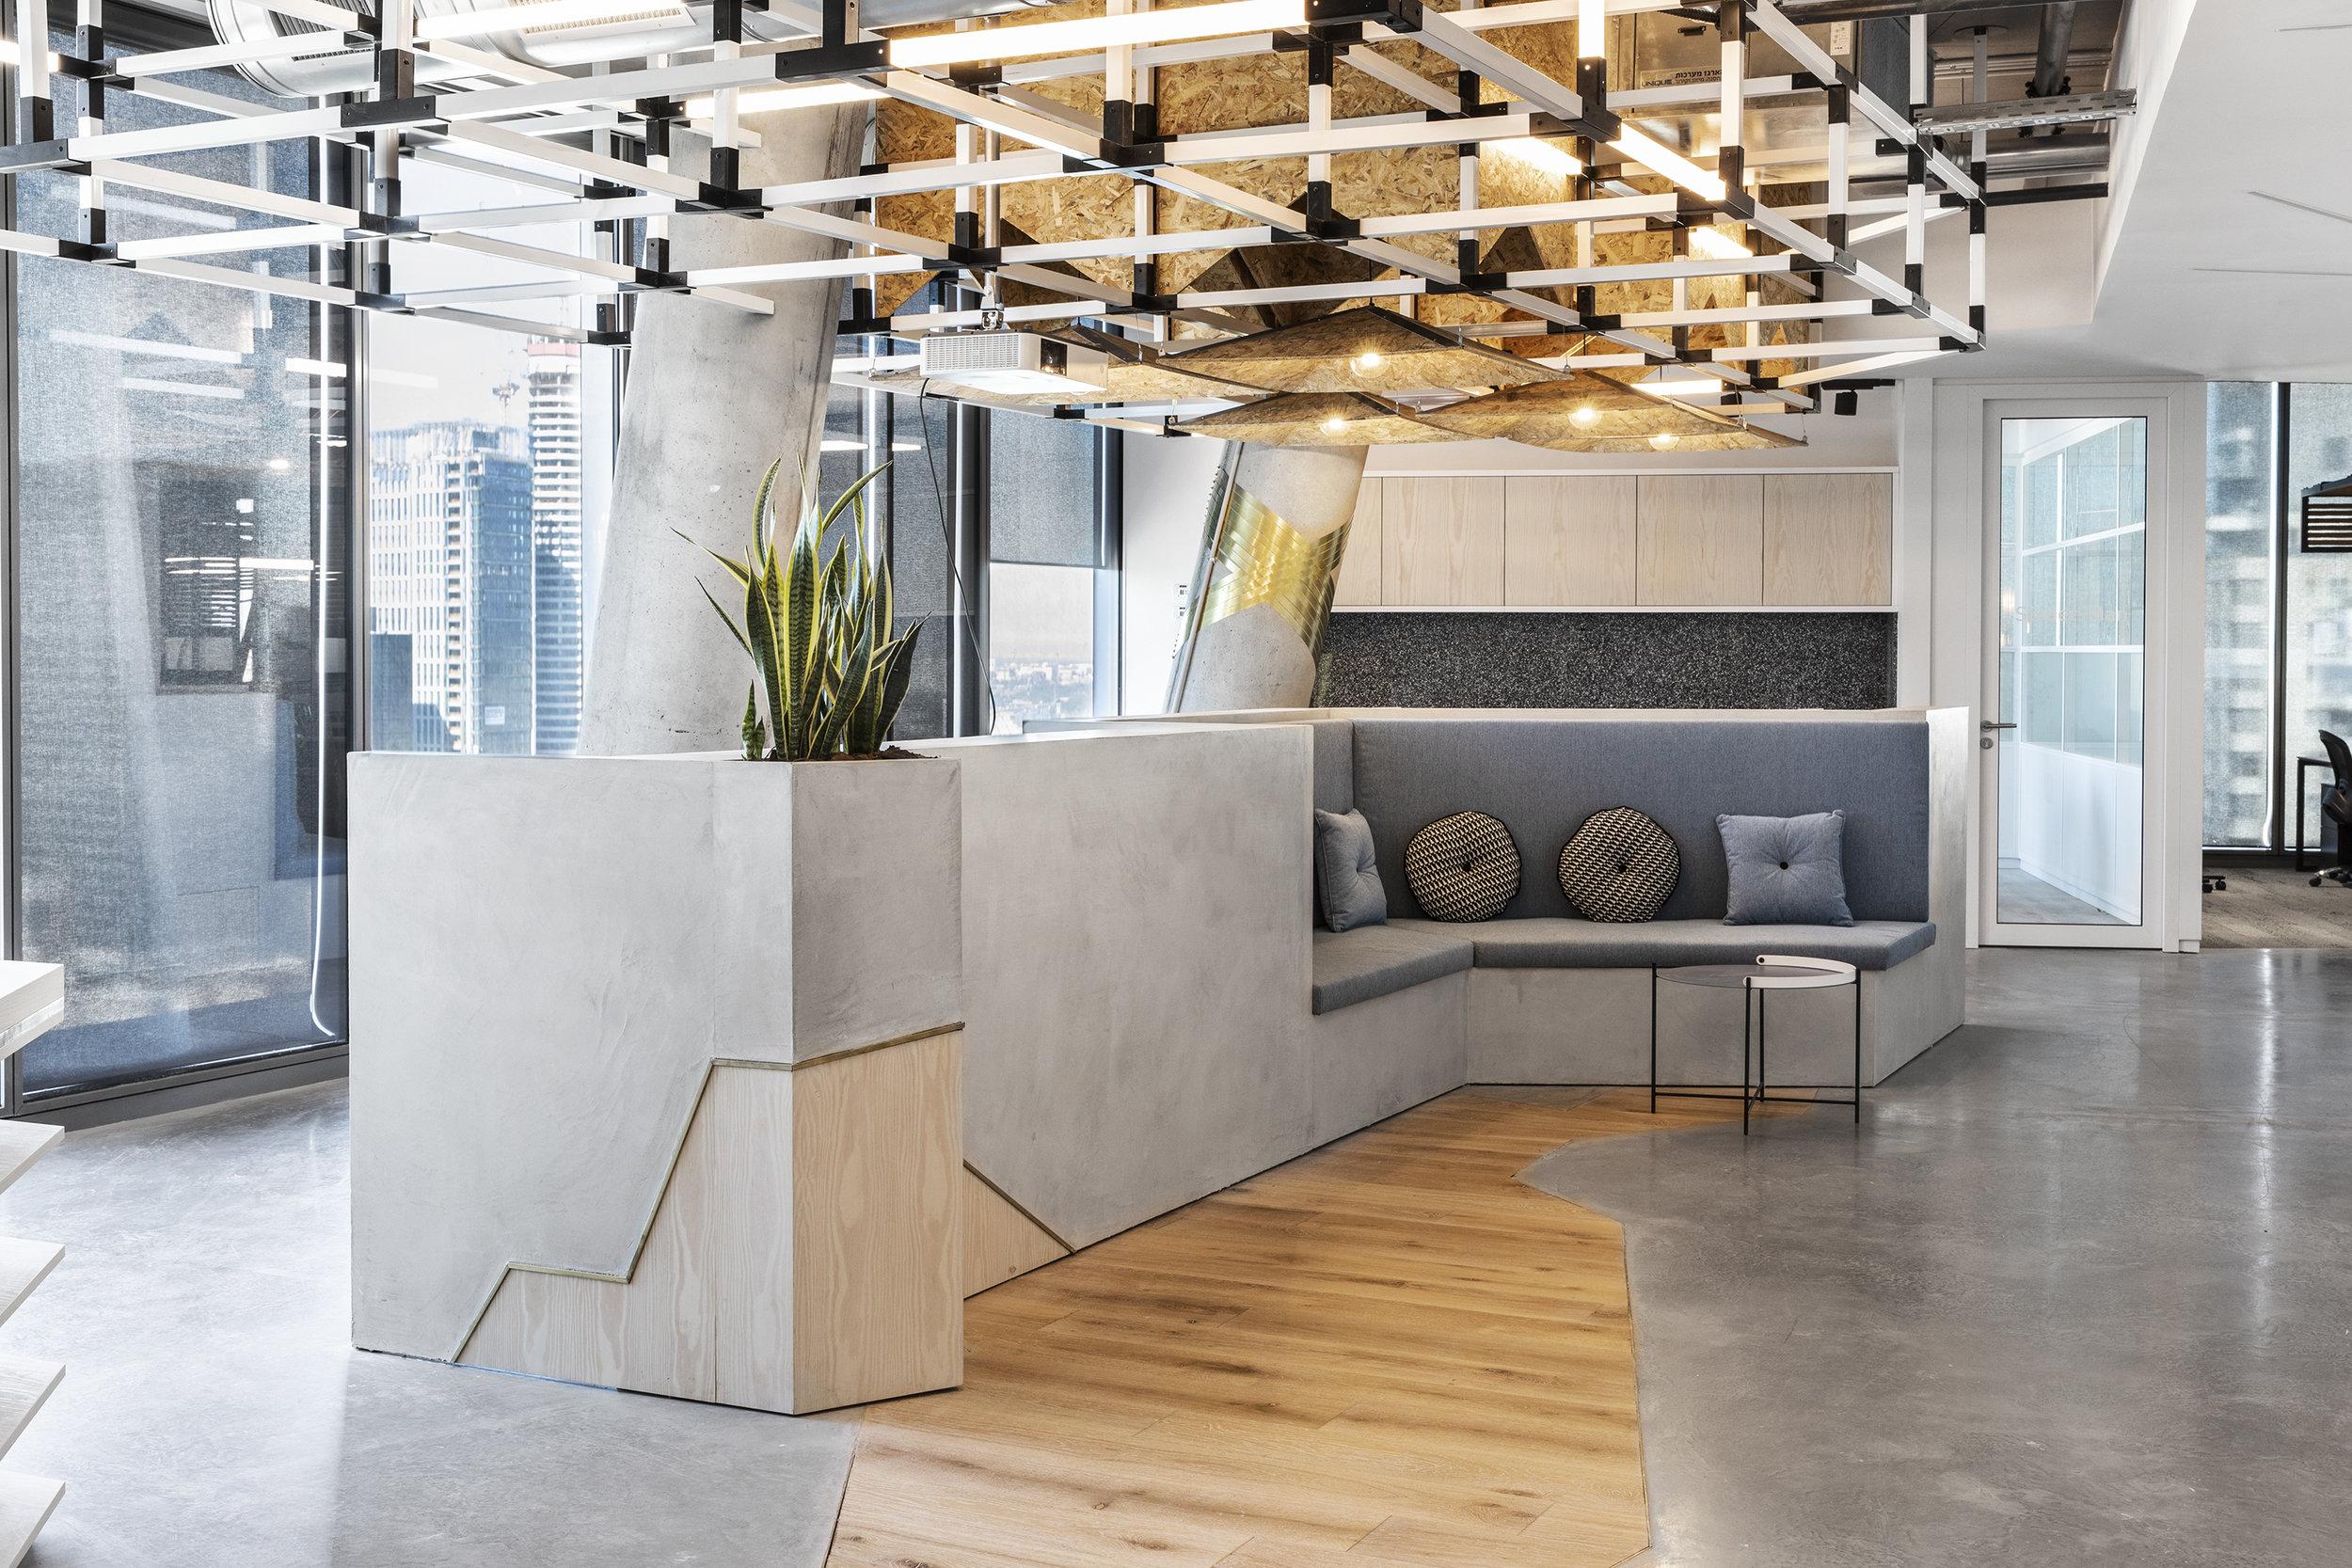 רואי דוד אדריכלות - אדריכל - נטורל אינטליג'נס - ROY DAVID - ARCHITECTURE - ARCHITECT - NI (57).jpg